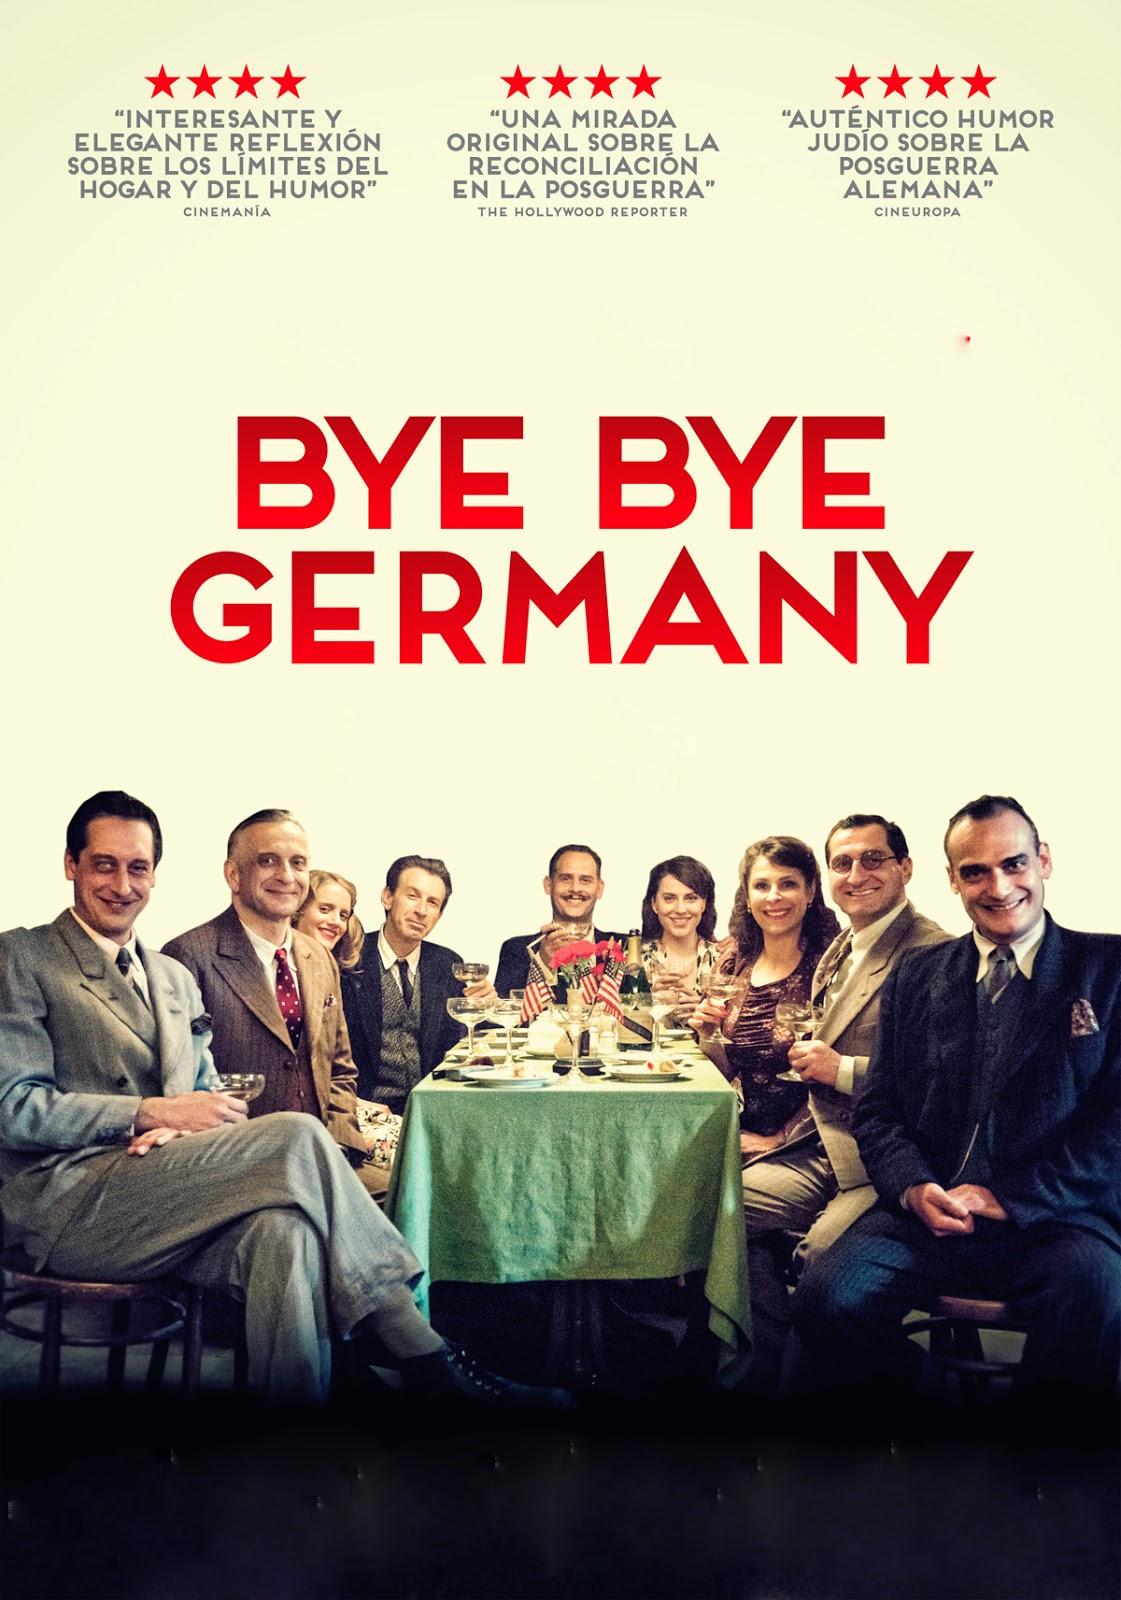 Bye Bye Germany [2017] [DVD9] [PAL] [Castellano]